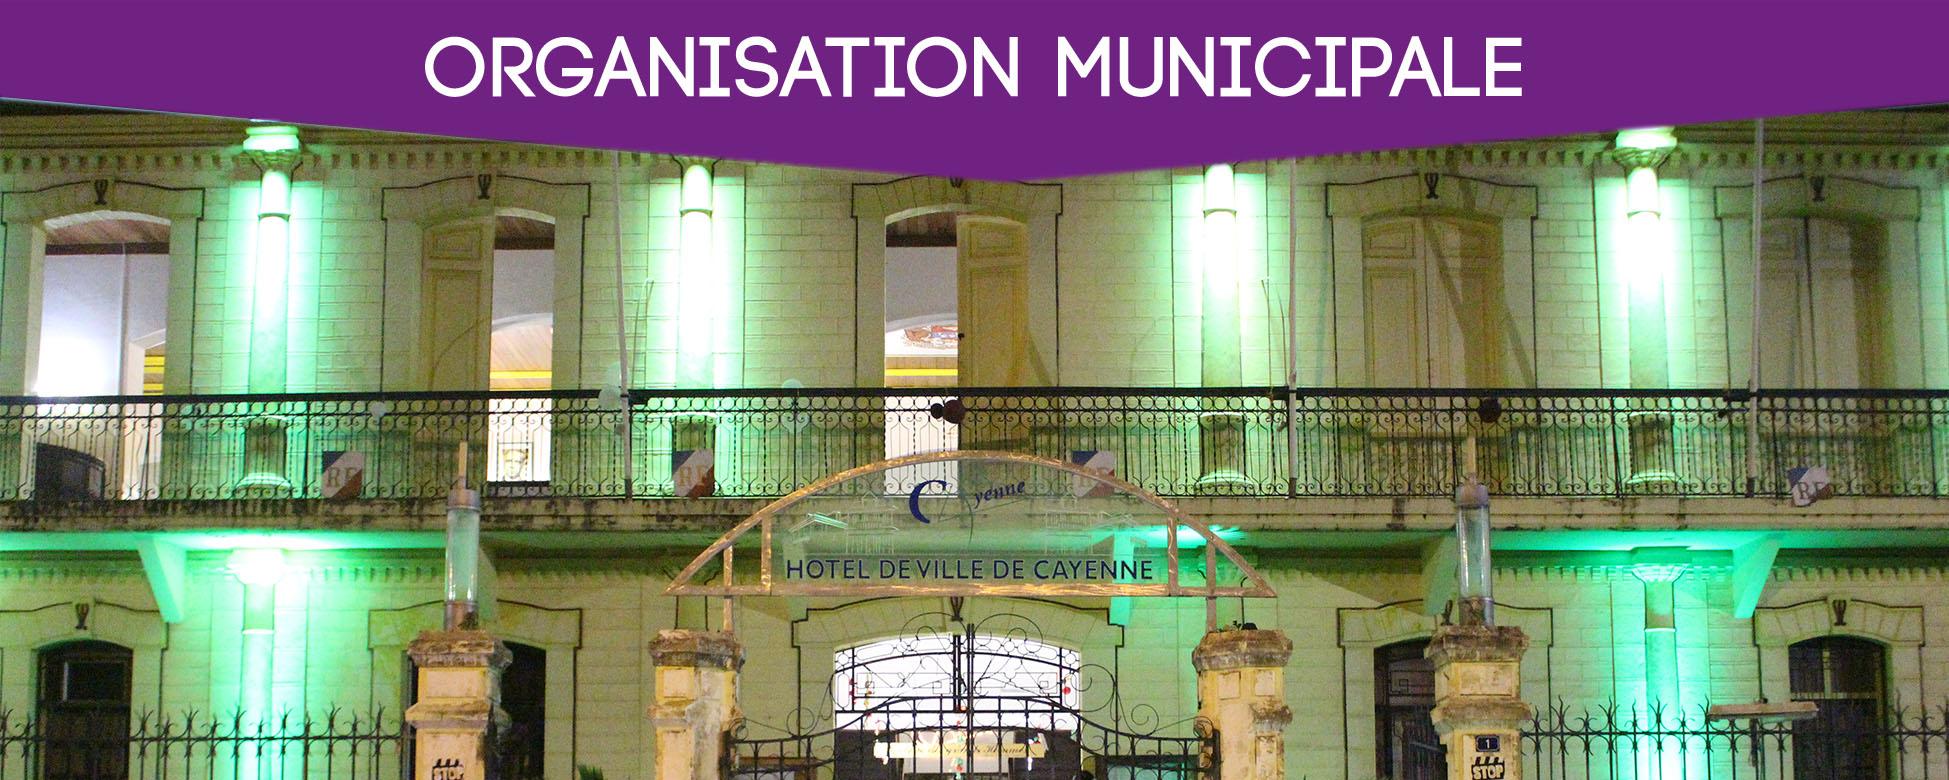 ORGANISATION MUNICIPALE